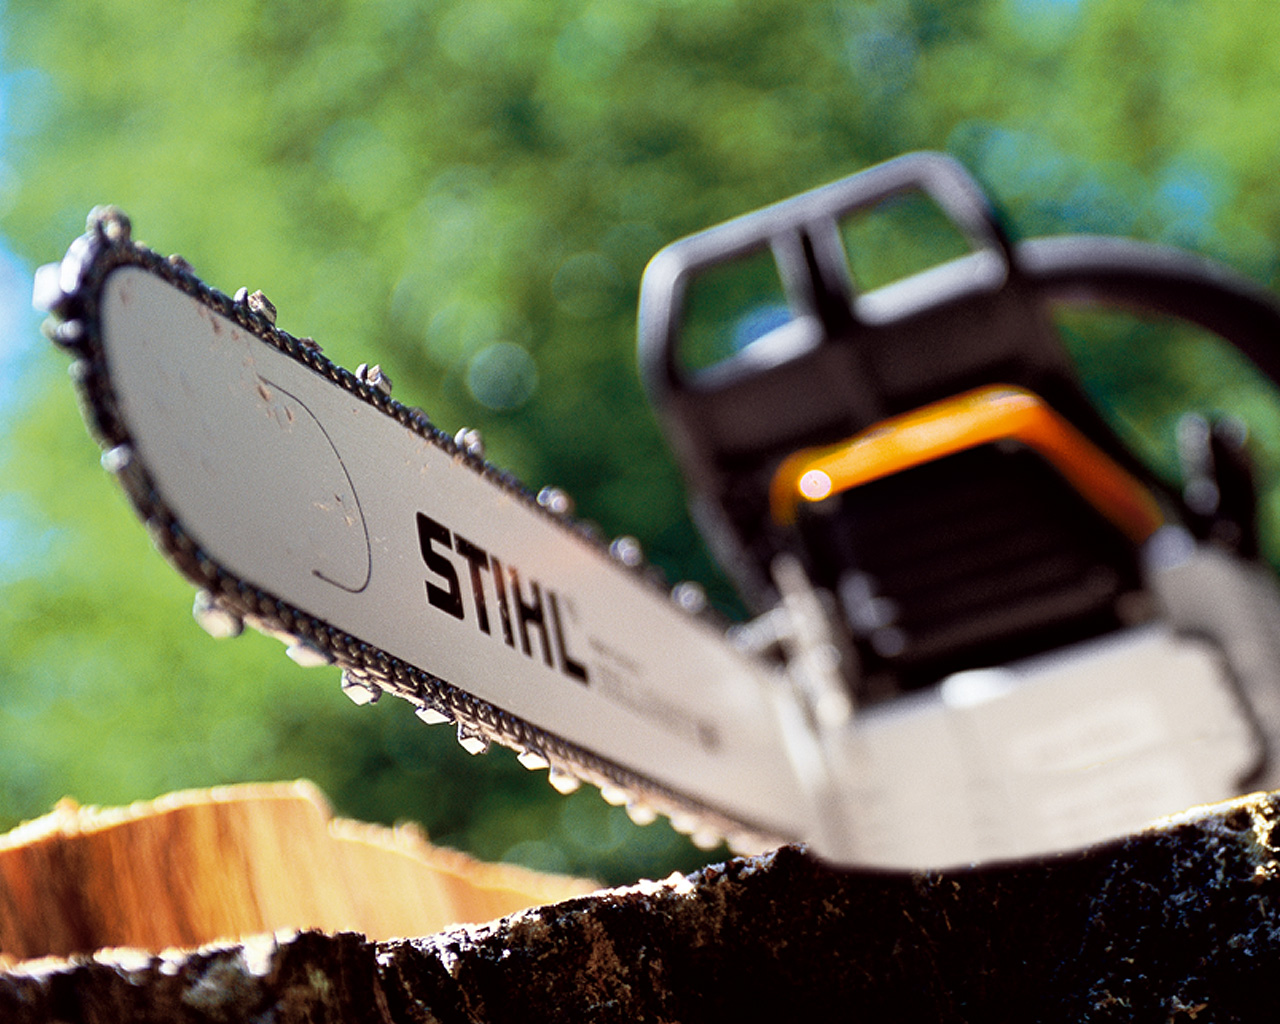 Stihl Chainsaw Wallpaper Stihl Chainsaw Desktop